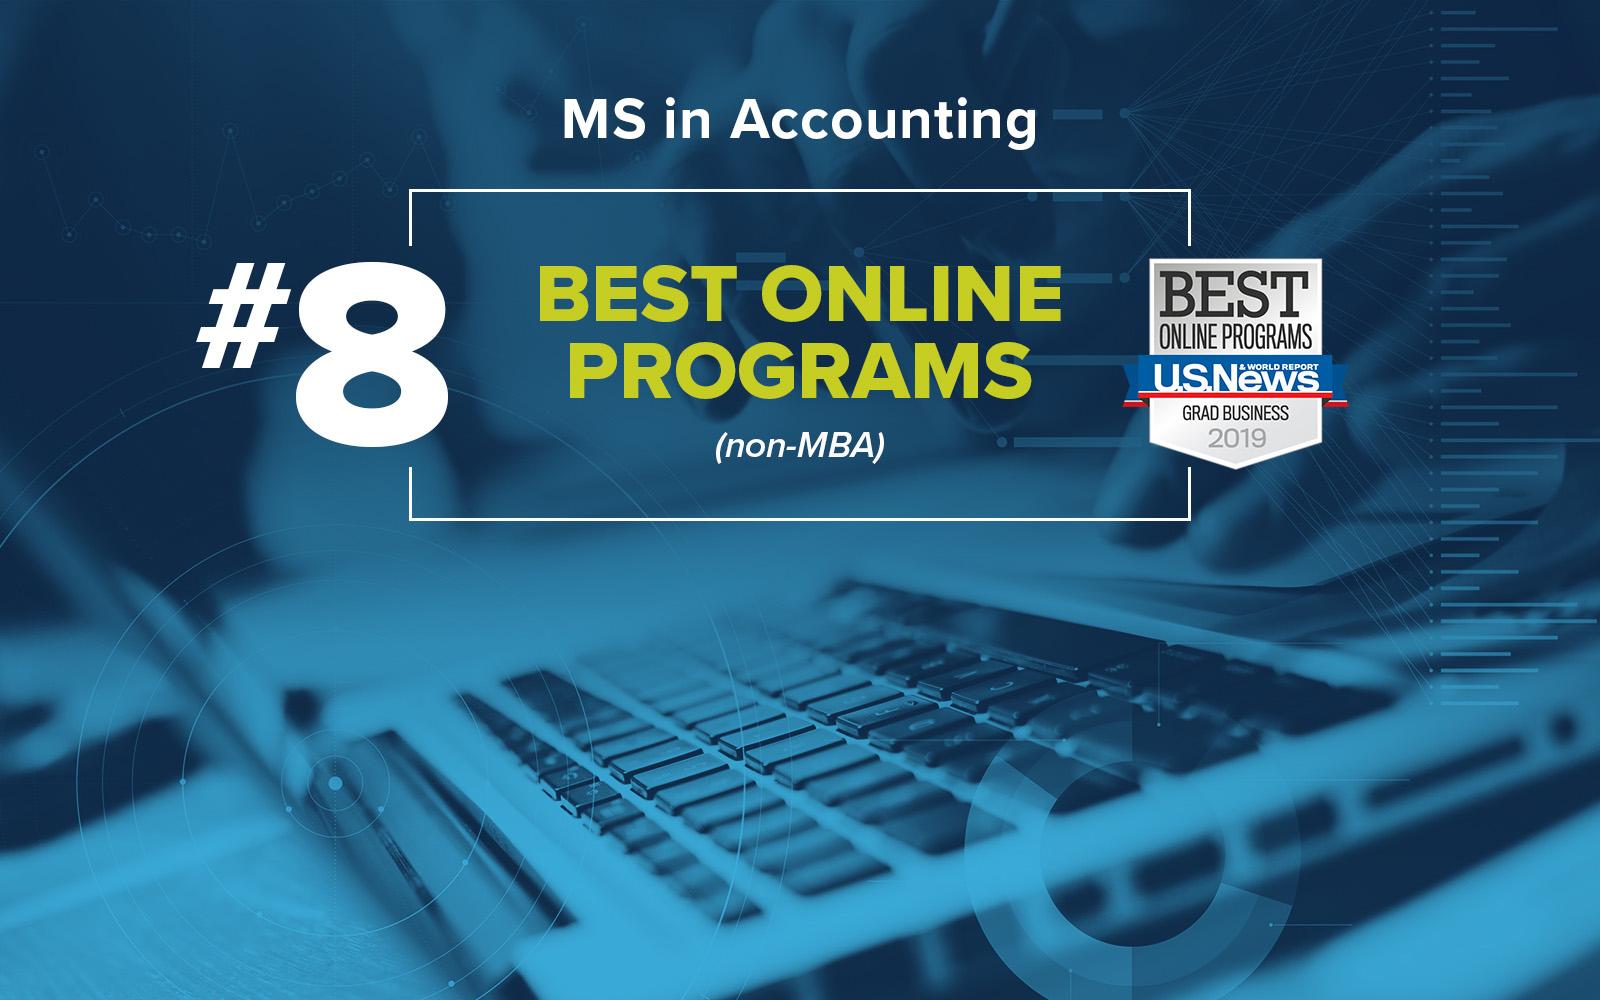 MSA Accounting - # 8 Best Online Programs (non MBA) - U.S. News & World Report